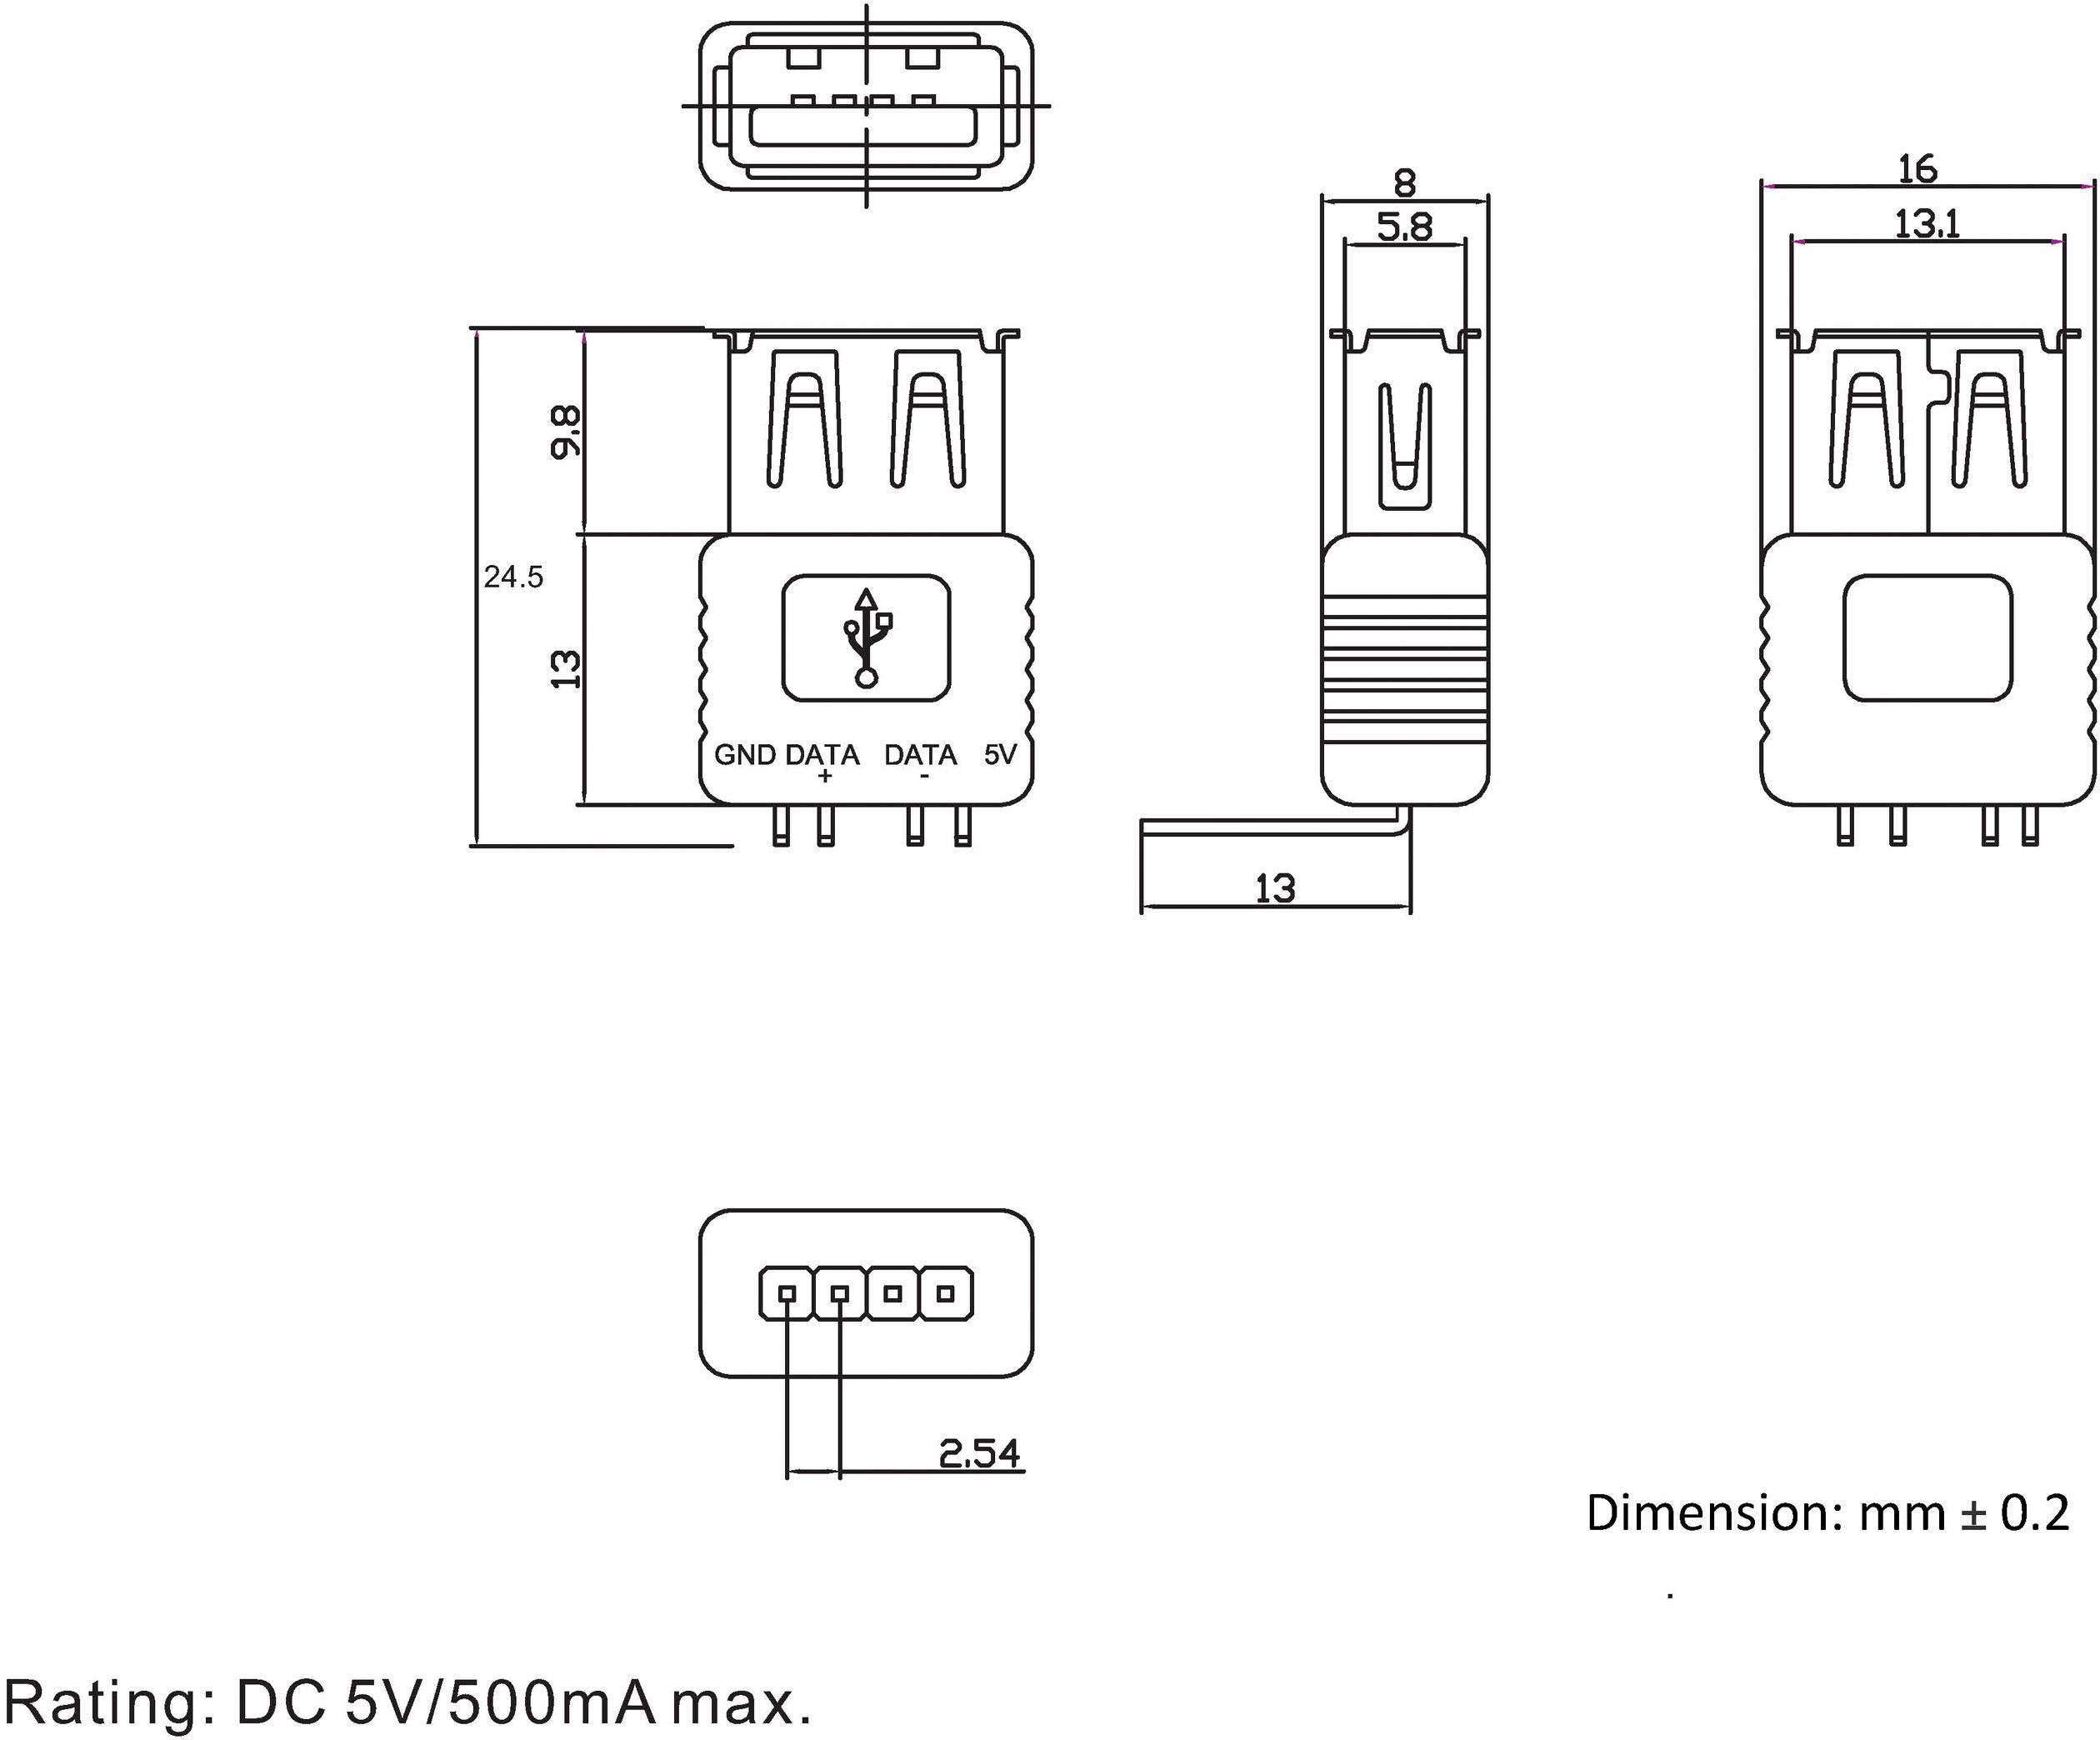 medium resolution of socket right angle socket right angle typ a 90 usb socket type a 90